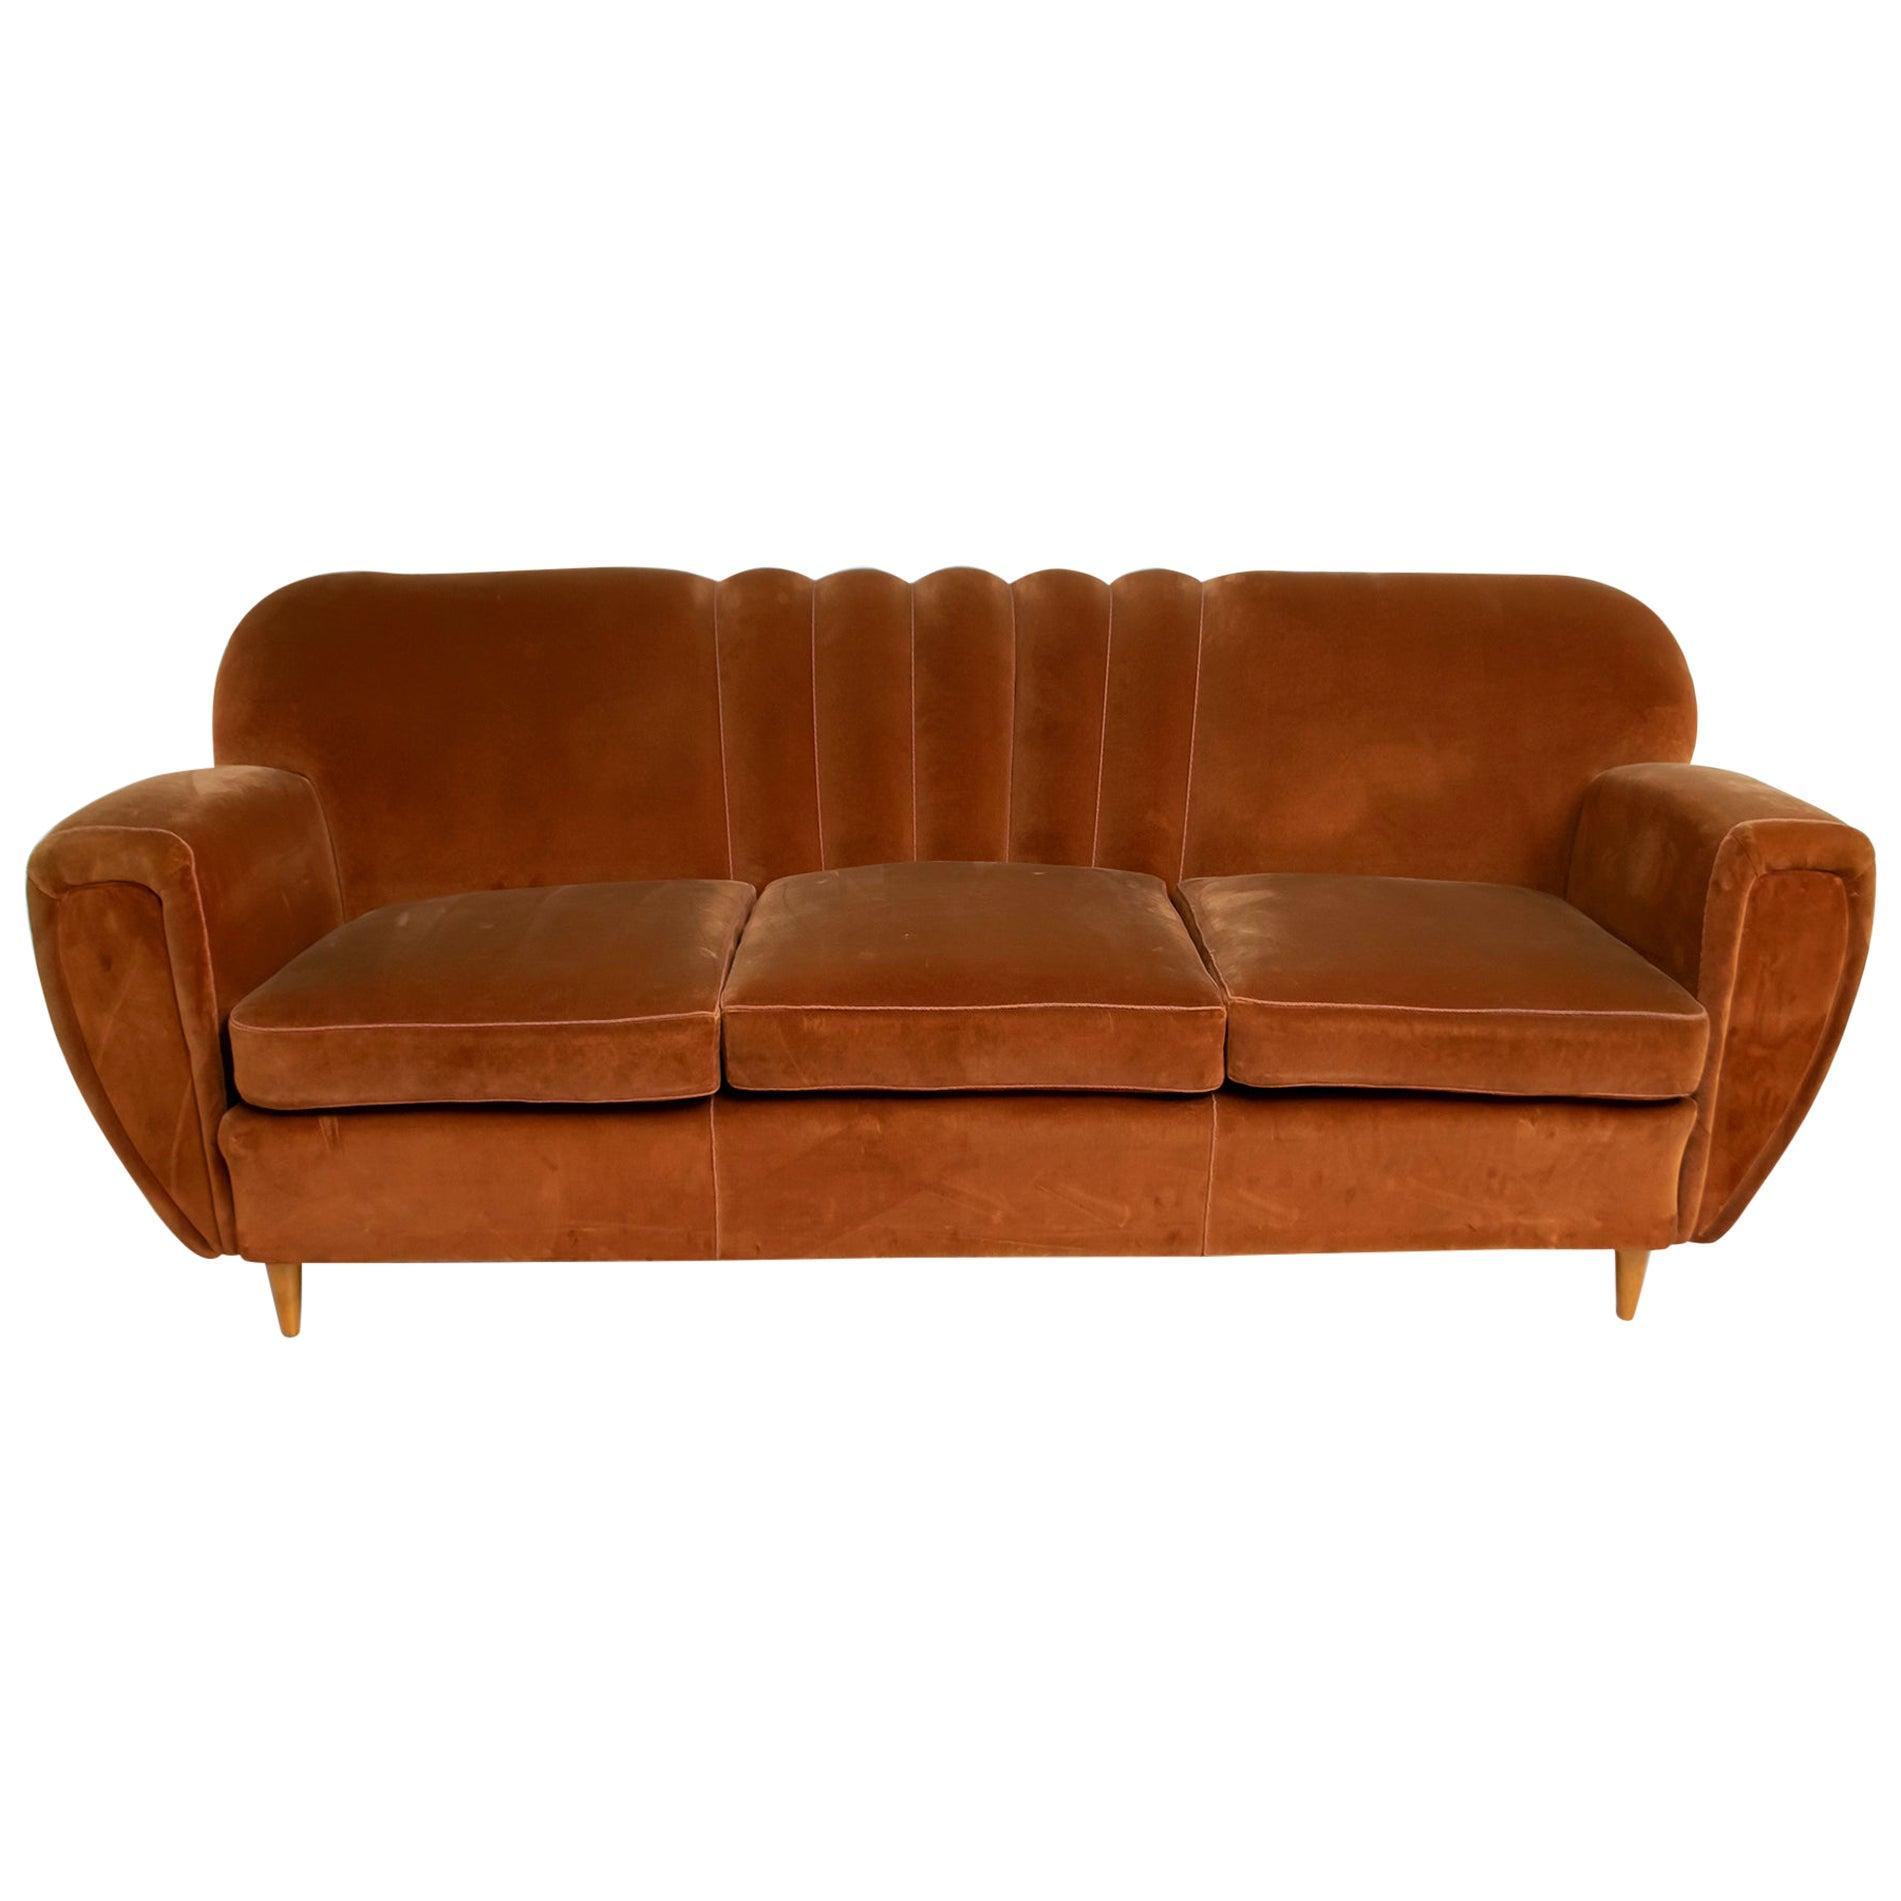 Gugliemo Ulrich Art Deco Italian Velvet Curved Sofa, 1940s